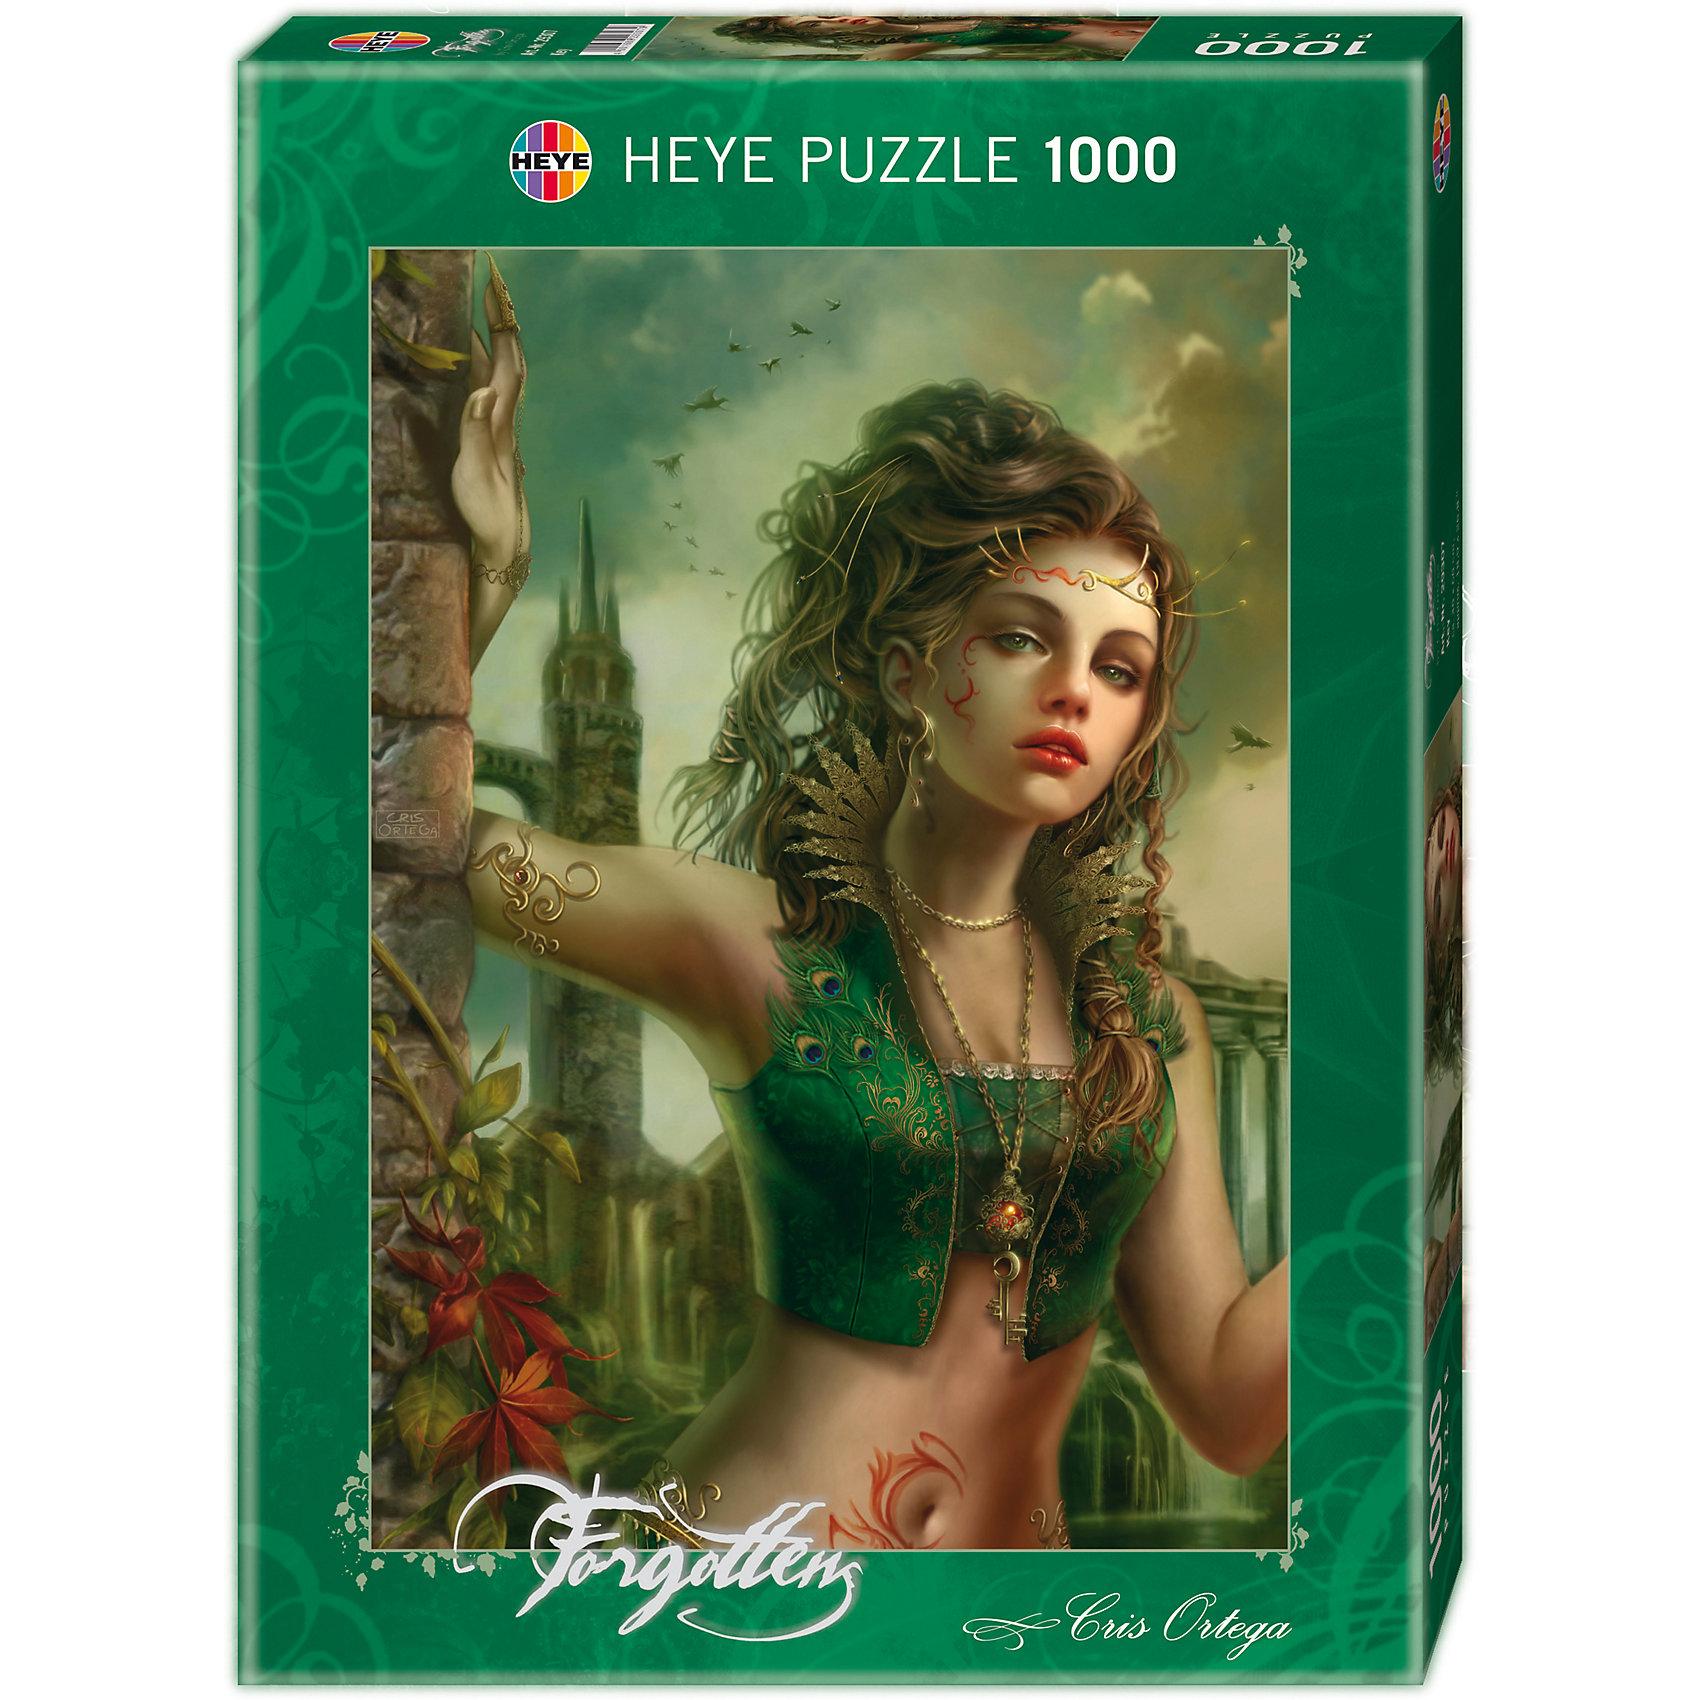 HEYE Пазл Ключ, 1000 деталей, HEYE пазлы magic pazle объемный 3d пазл эйфелева башня 78x38x35 см